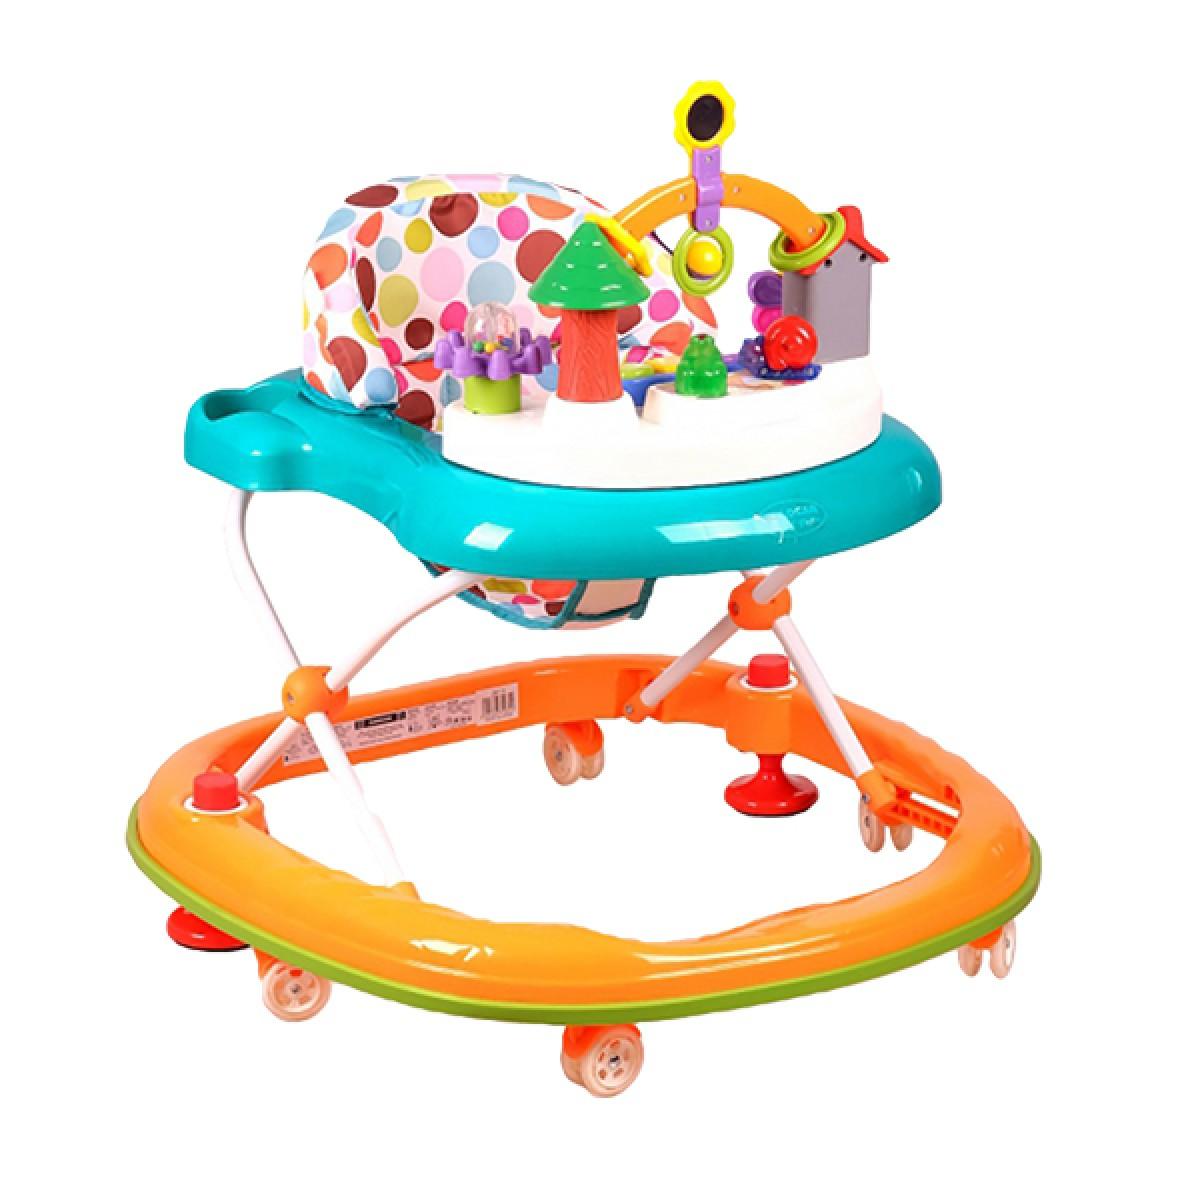 (316) BABY WALKER - Kico Baby Center